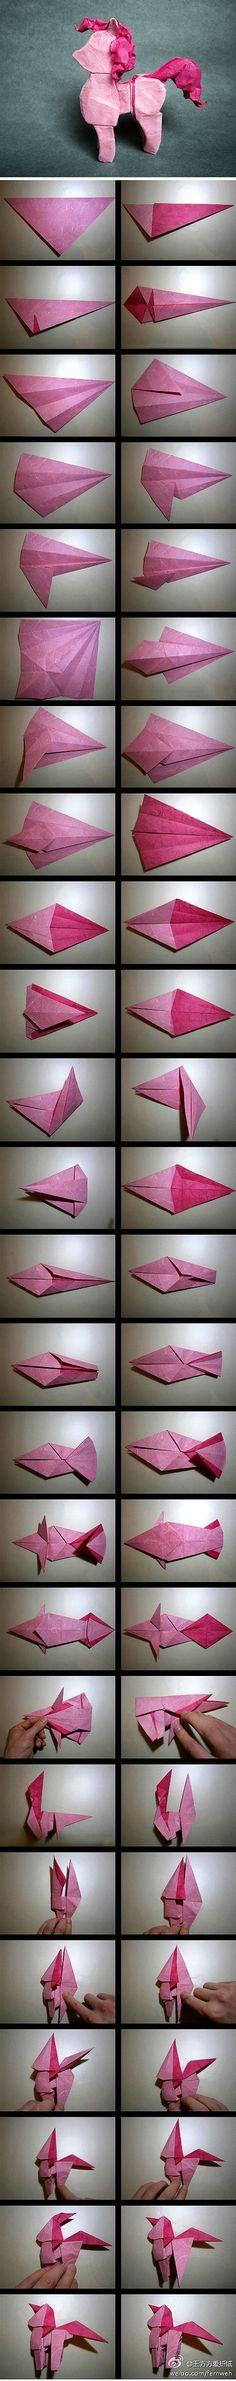 my little pony origami